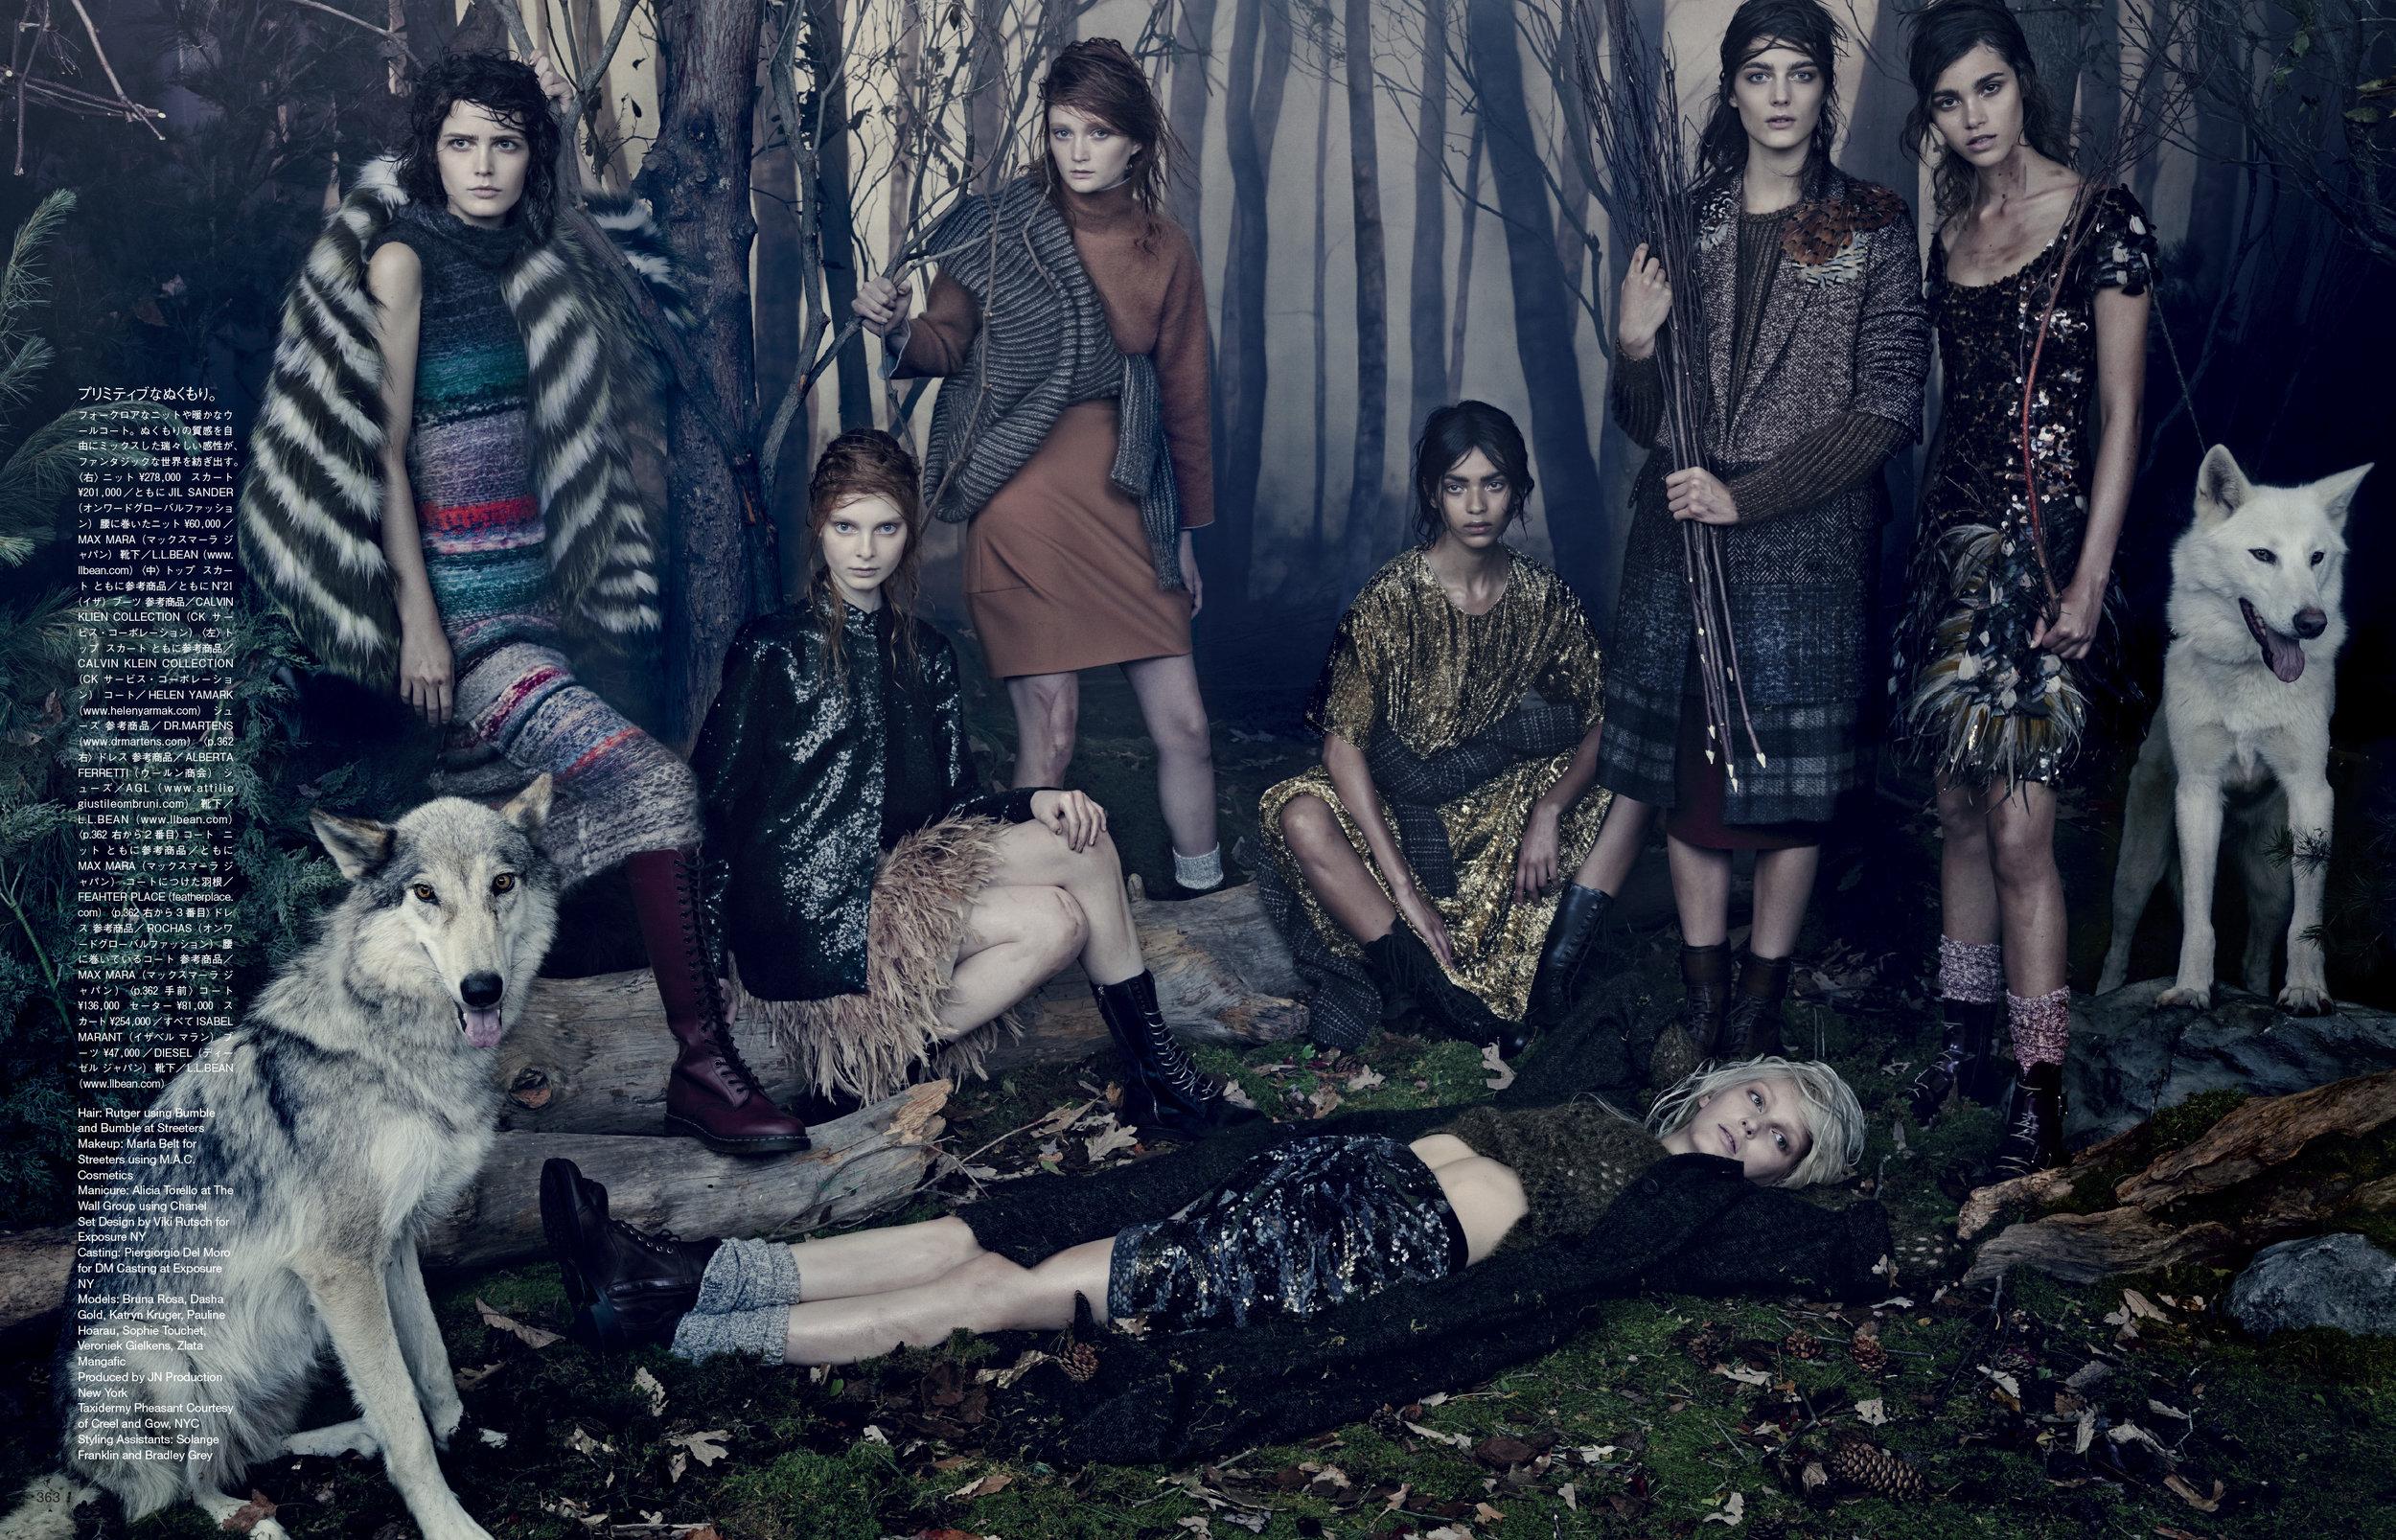 Giovanna-Battaglia-Into-The-Woods-Vogue-Japan-Emma-Summerton-10.jpg